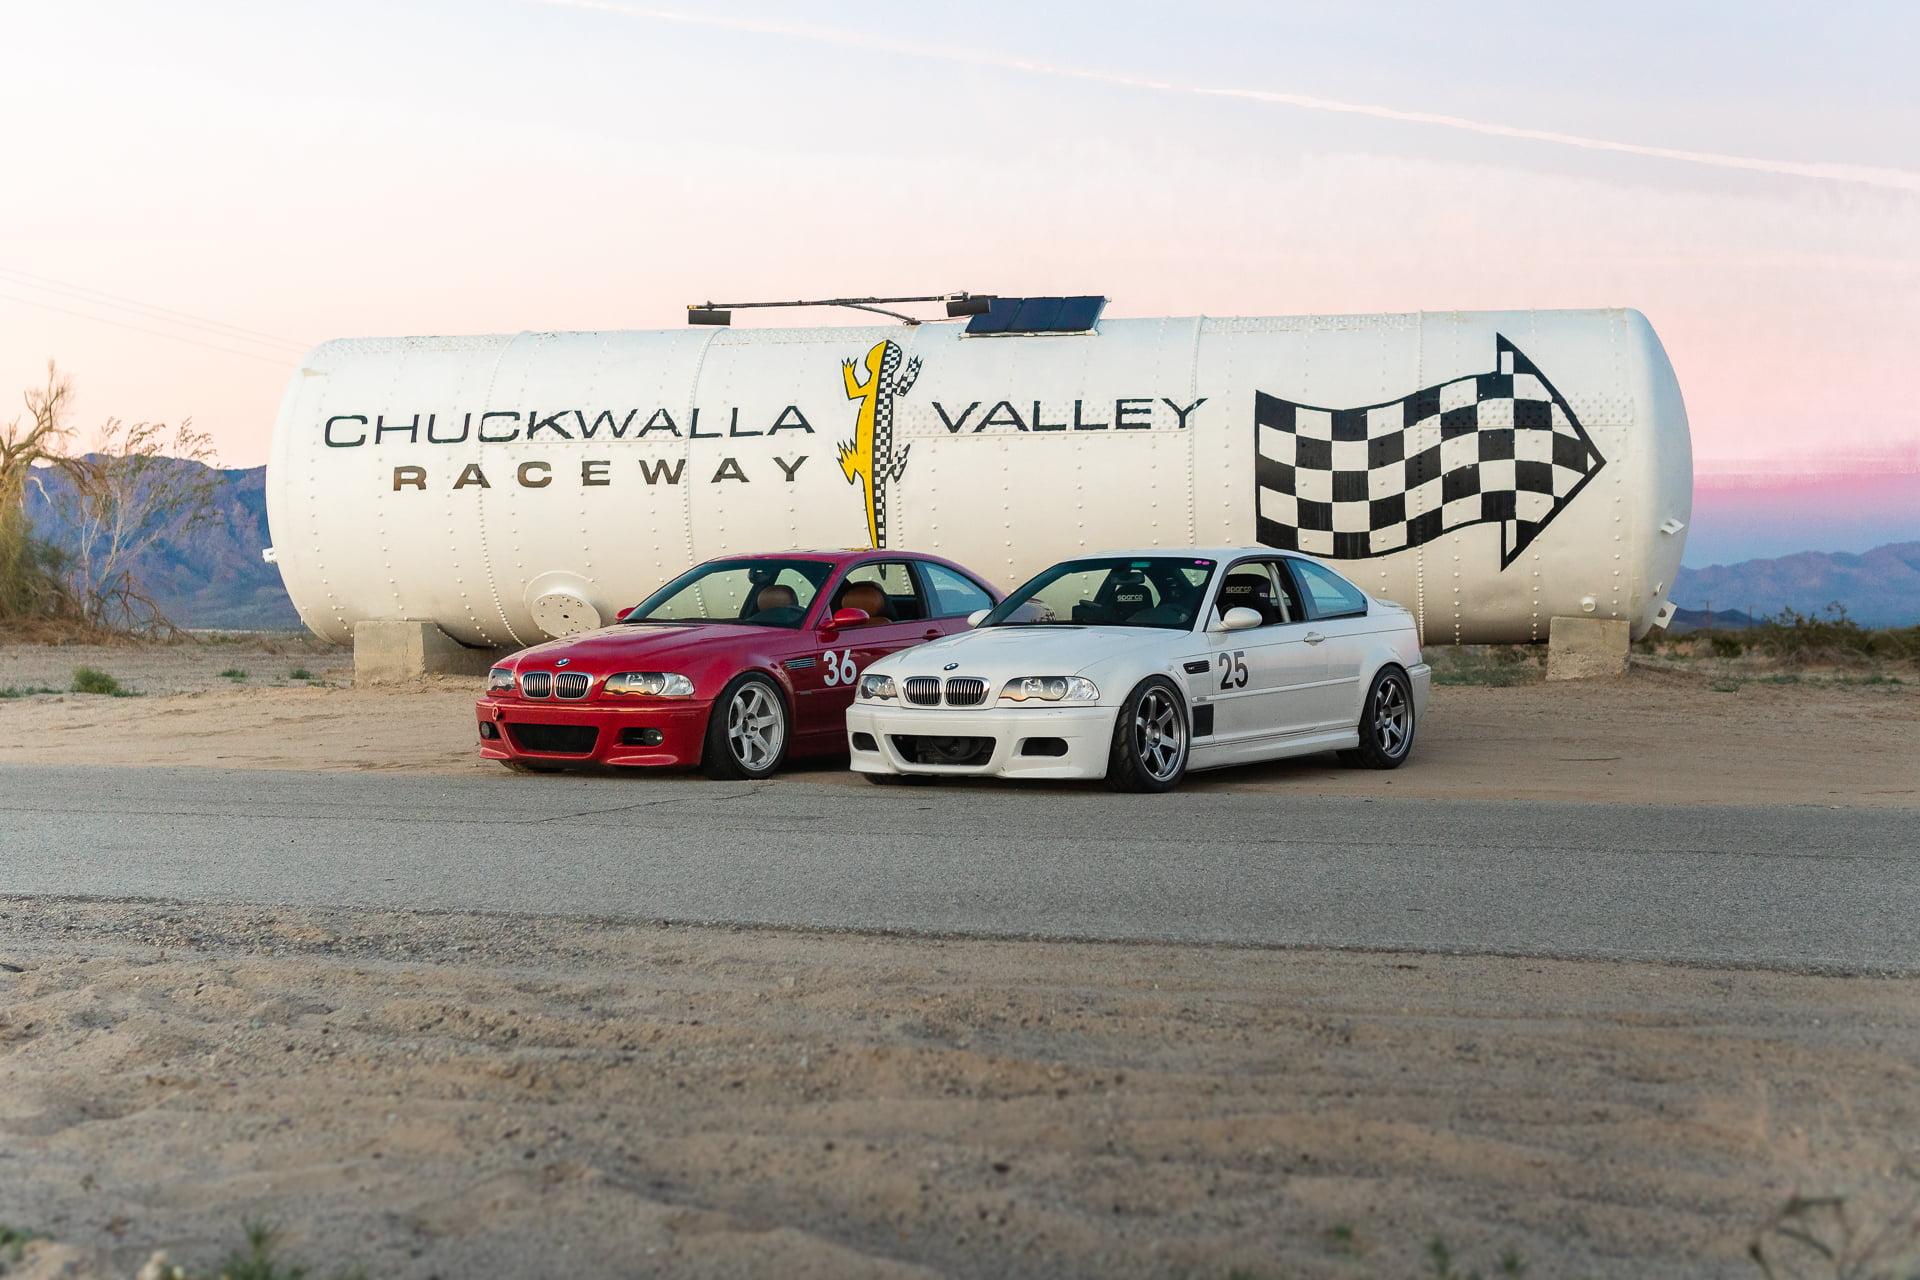 BIMMER CHALLENGE - Chuckwalla Valley Raceway